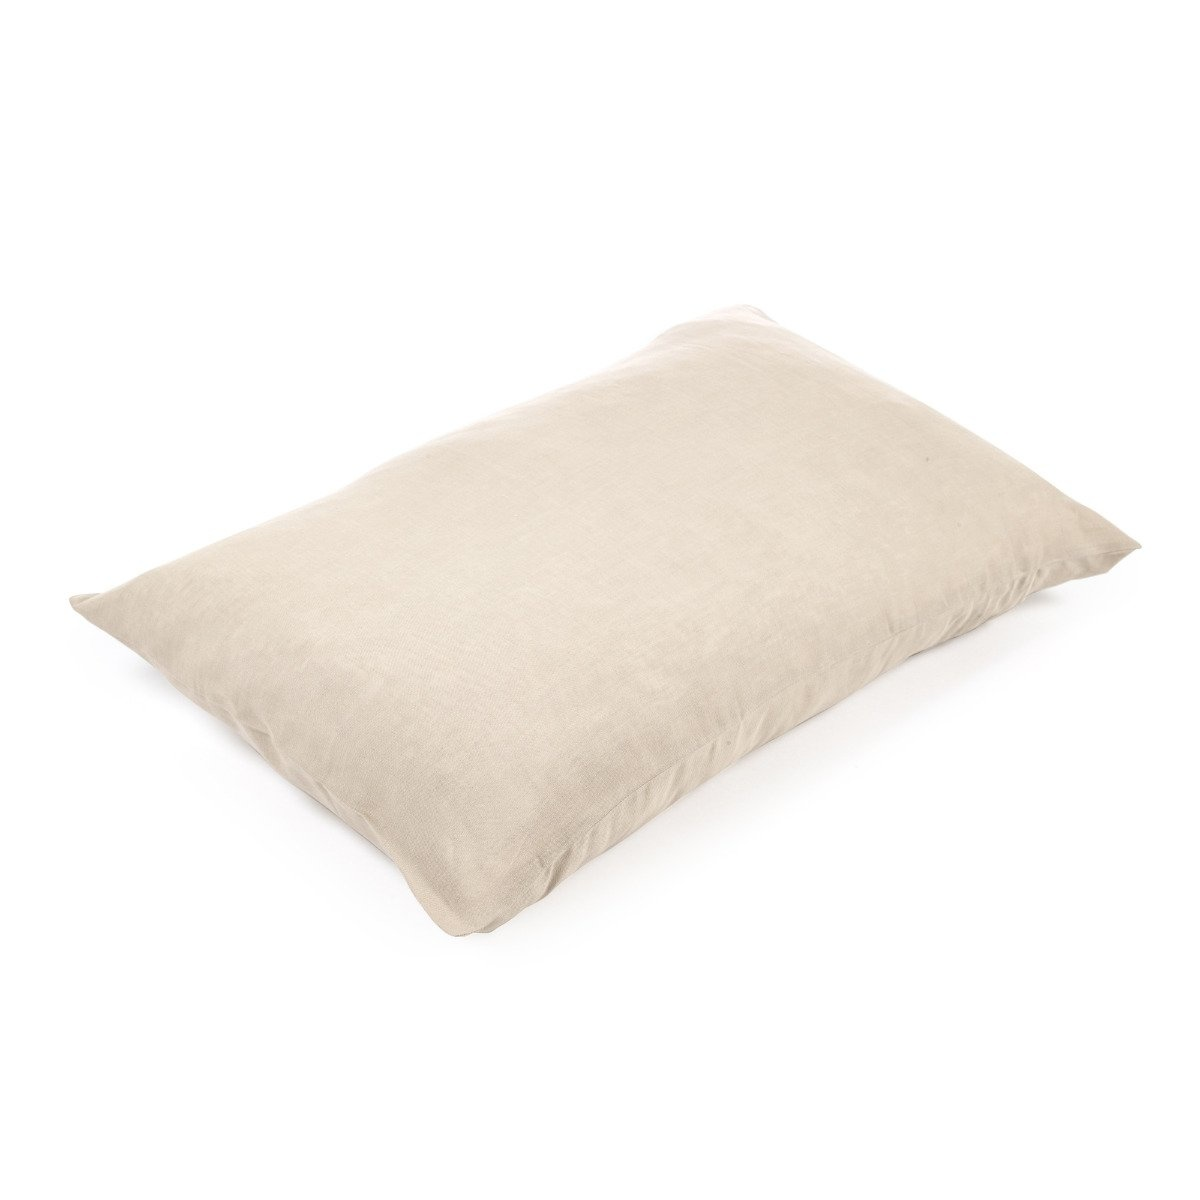 Pillow Sham - Santiago - Asst Colours-5